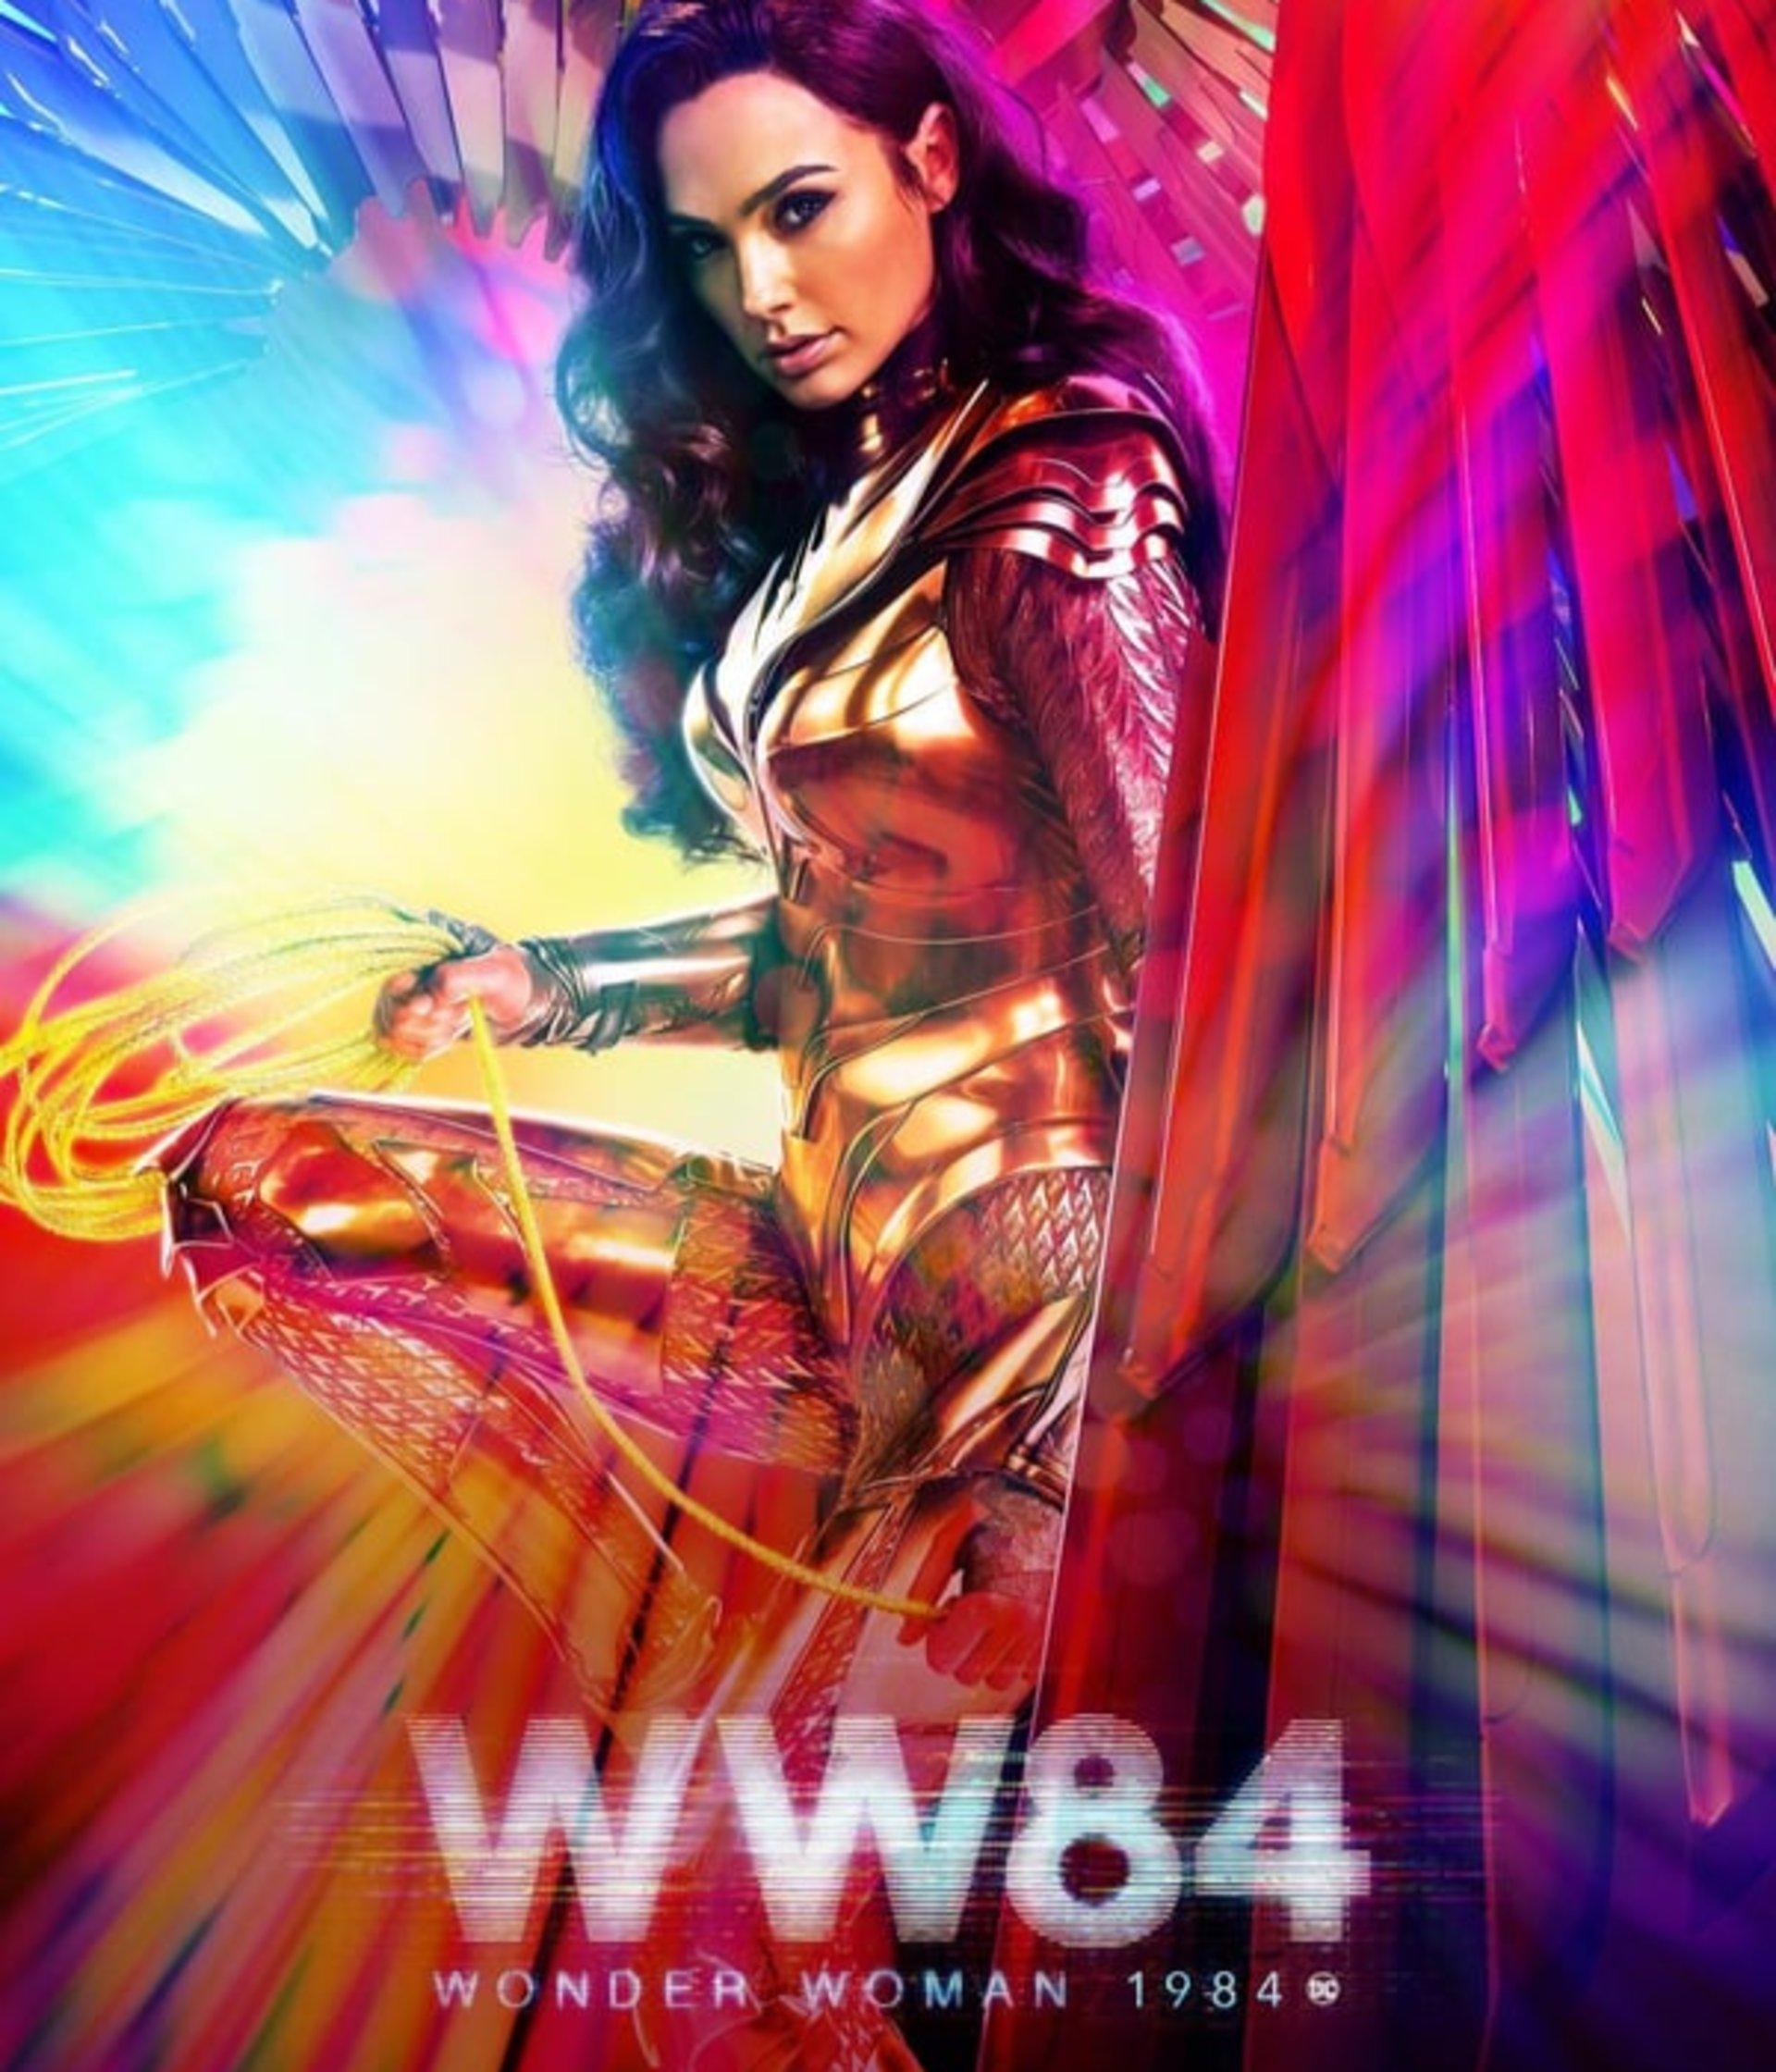 Nonton Film Wonder Woman (2020) Mp4 Sub Indo LK21 | Chirpstory